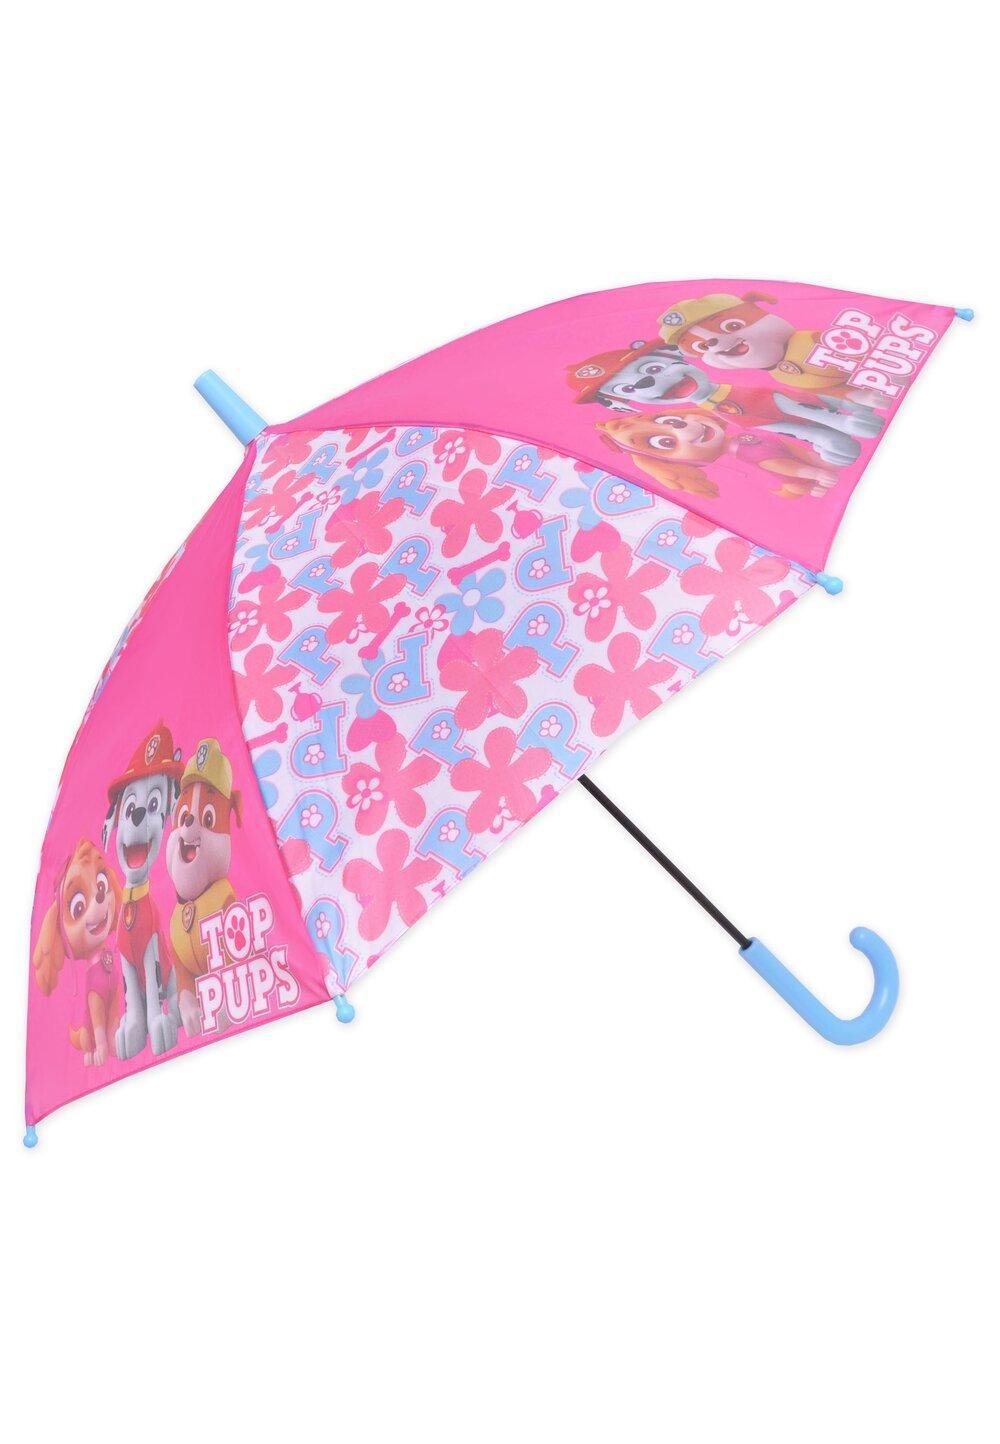 Umbrela, Top pups, roz imagine